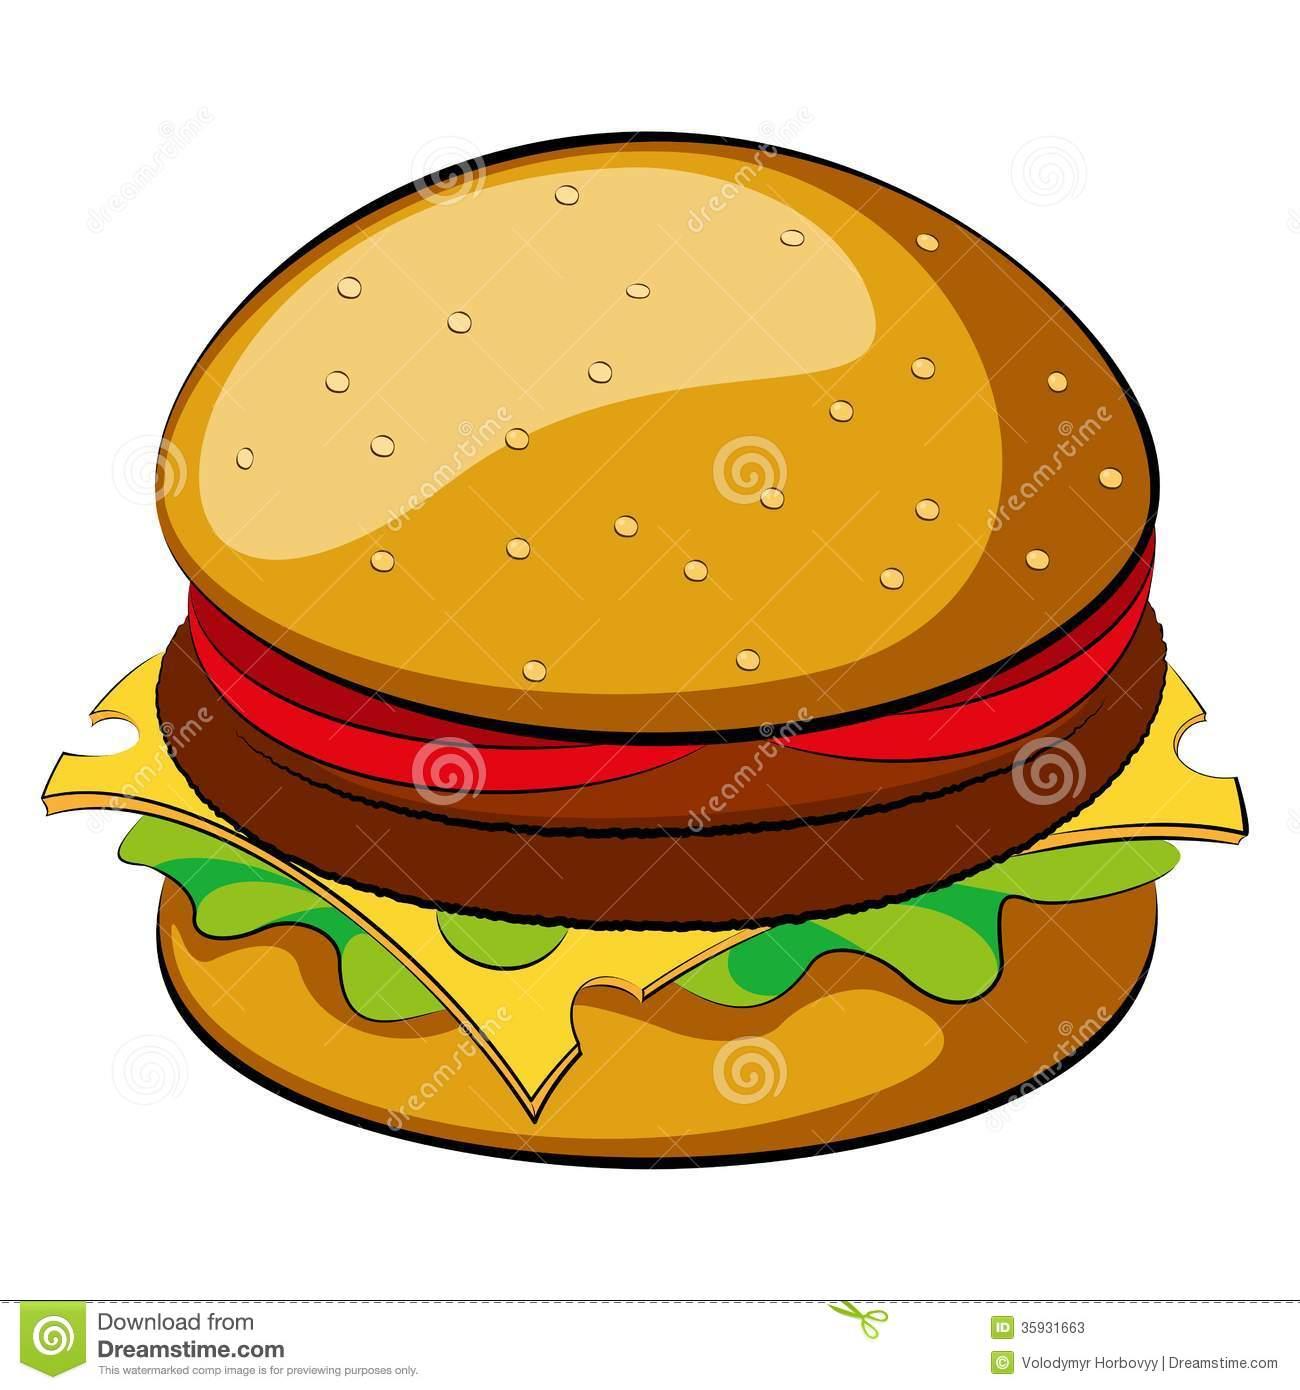 Clip art jpg clipartix. Burger clipart clear background